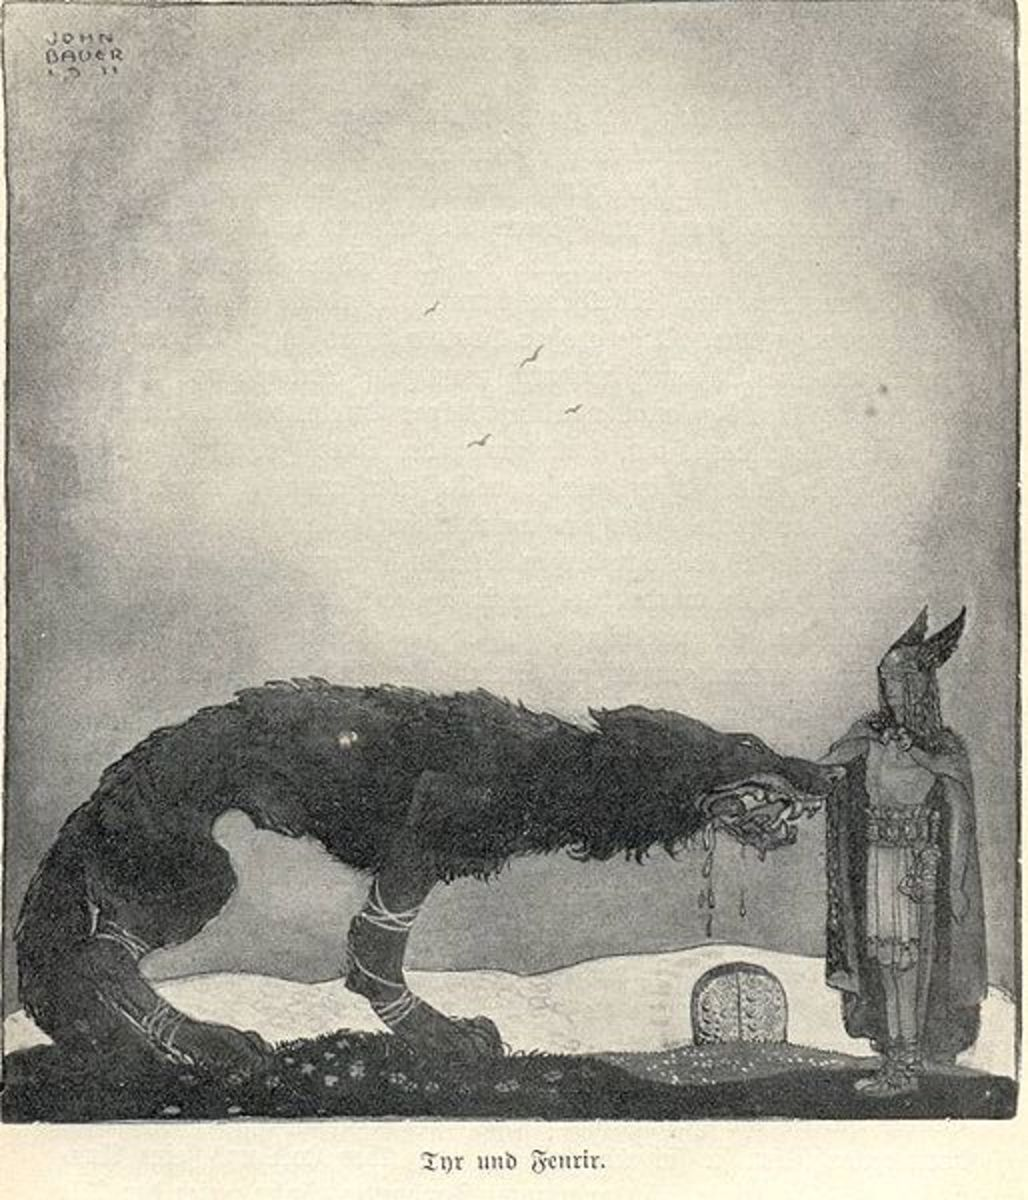 'Tyr and Fenrir', John Bauer, 1911.